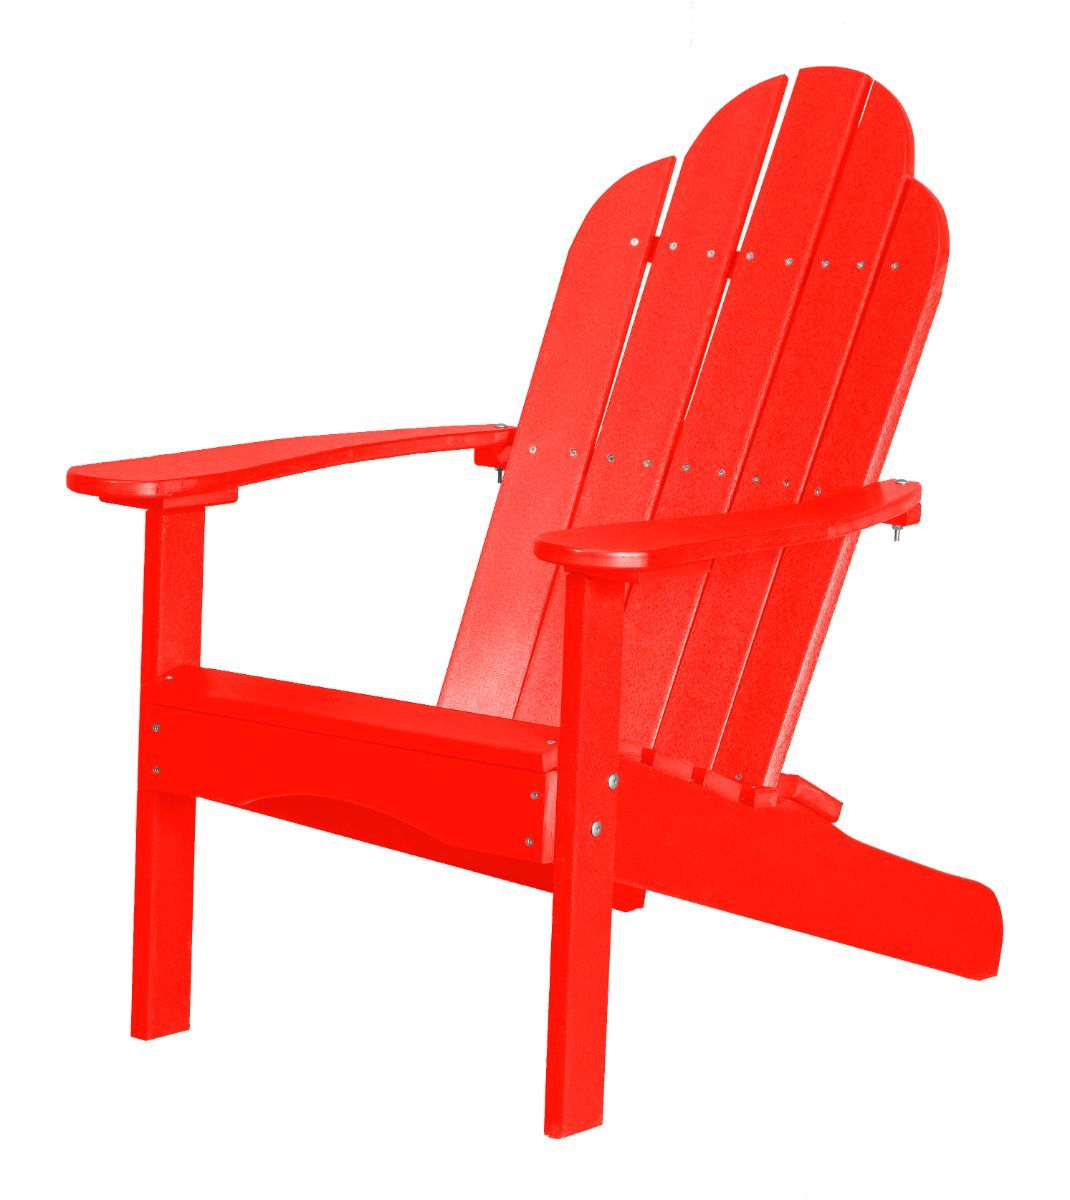 Bright Red Odessa Adirondack Chair